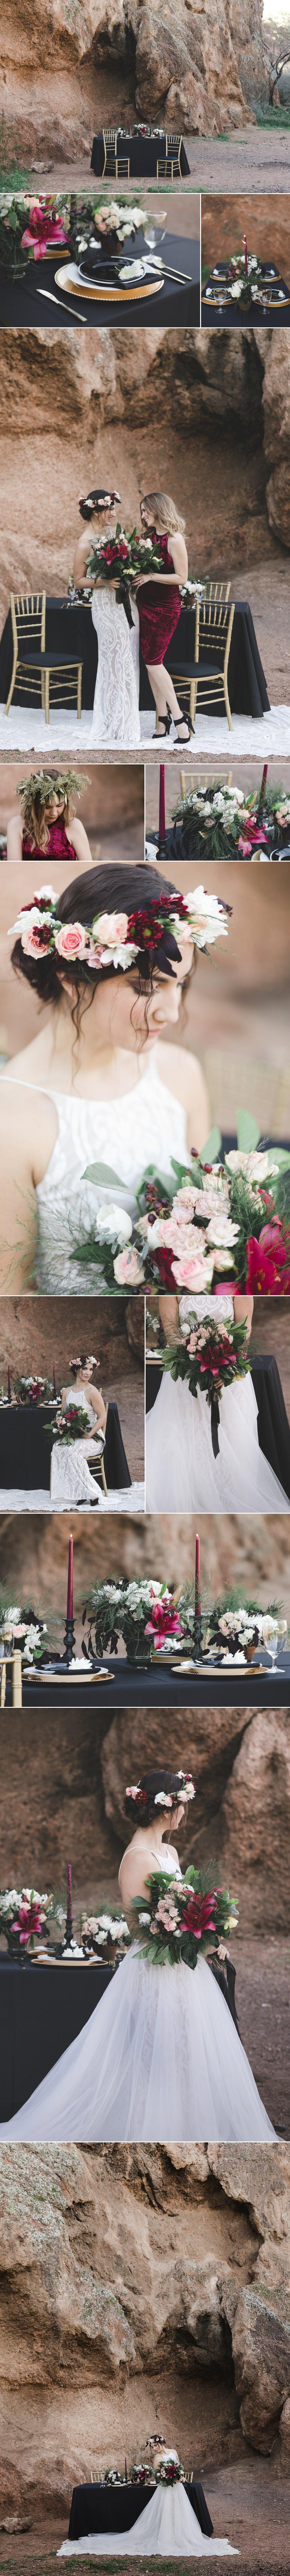 Honey & Shaw: Dark and Moody Styled Bridal